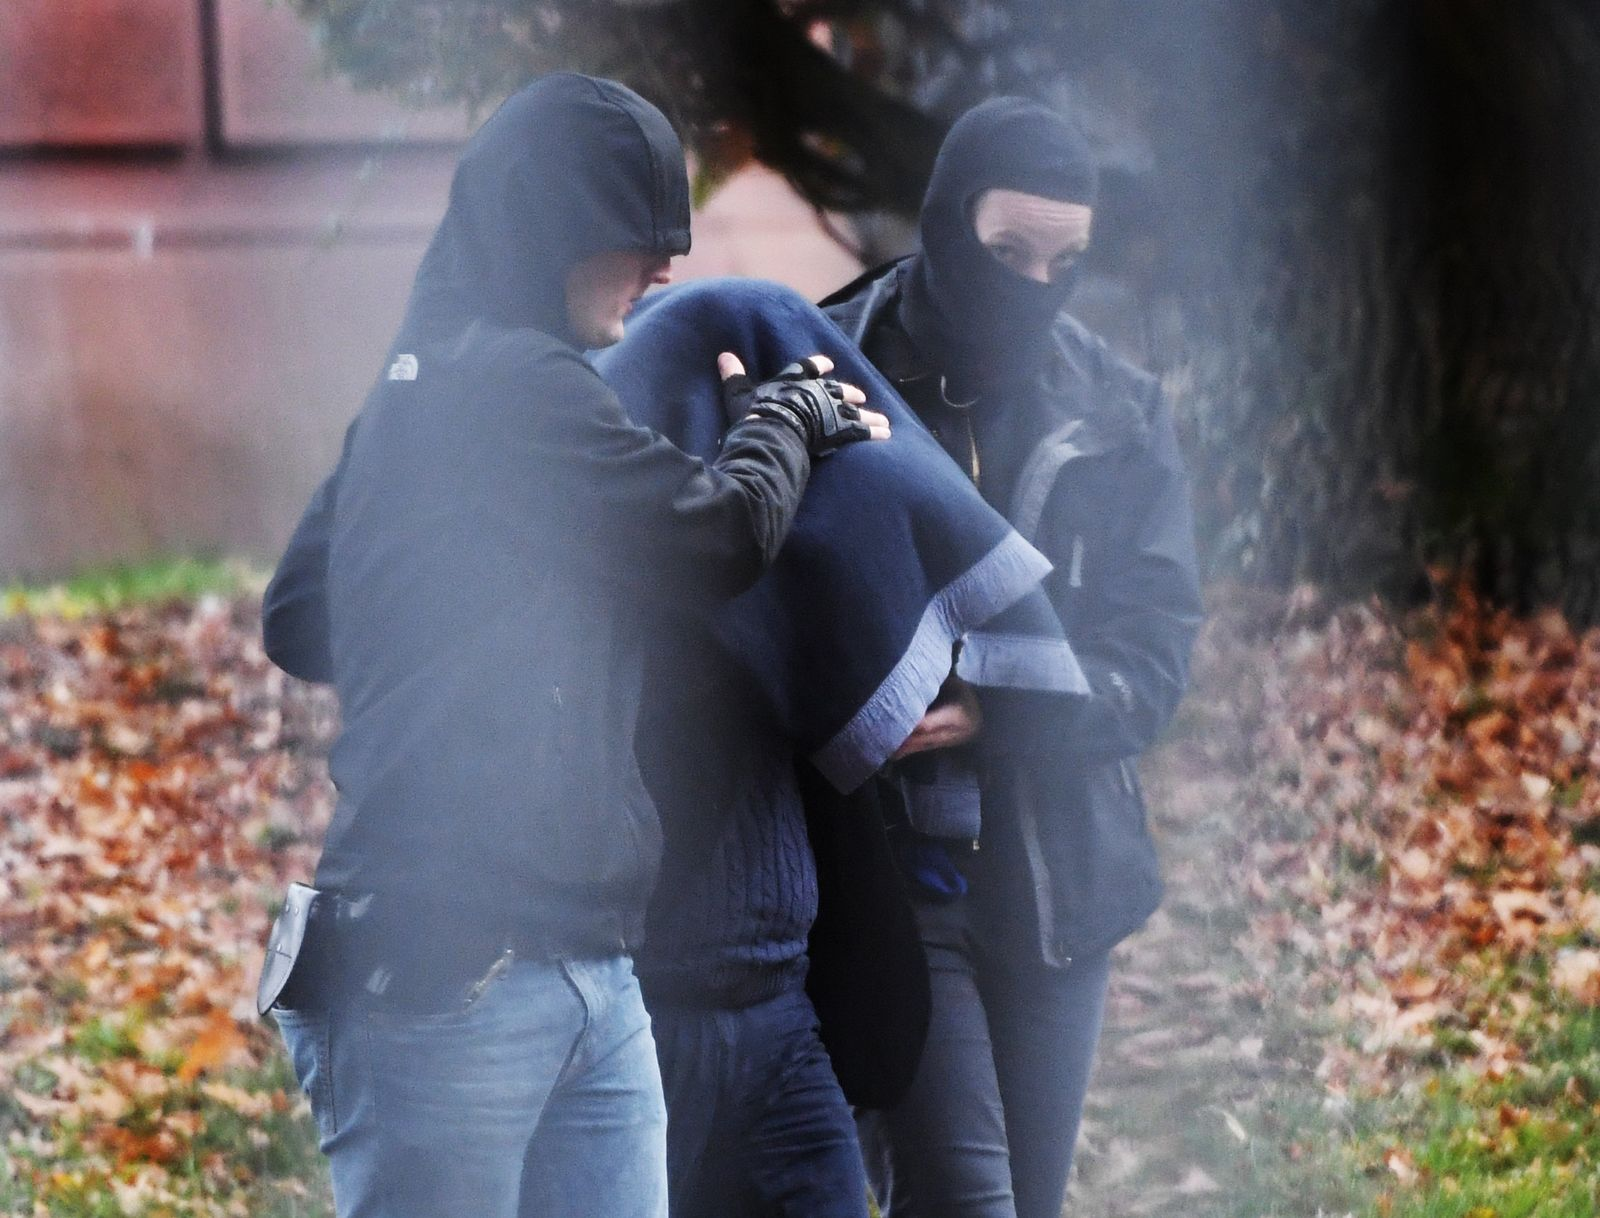 Baden-Württemberg / Karlsruhe / IS-Verdächtige festgenommen